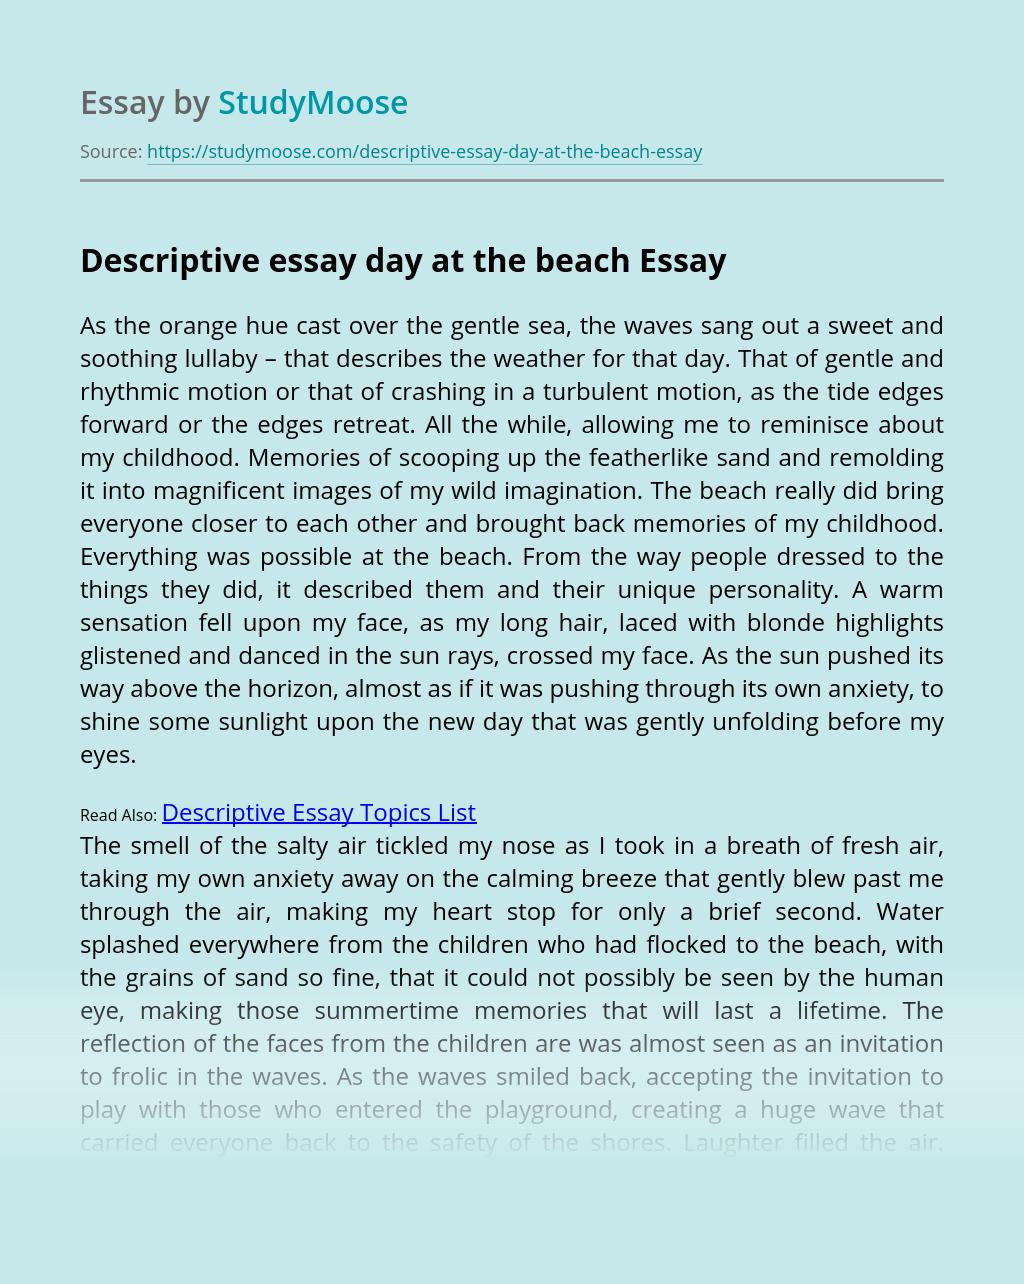 Descriptive essay day at the beach